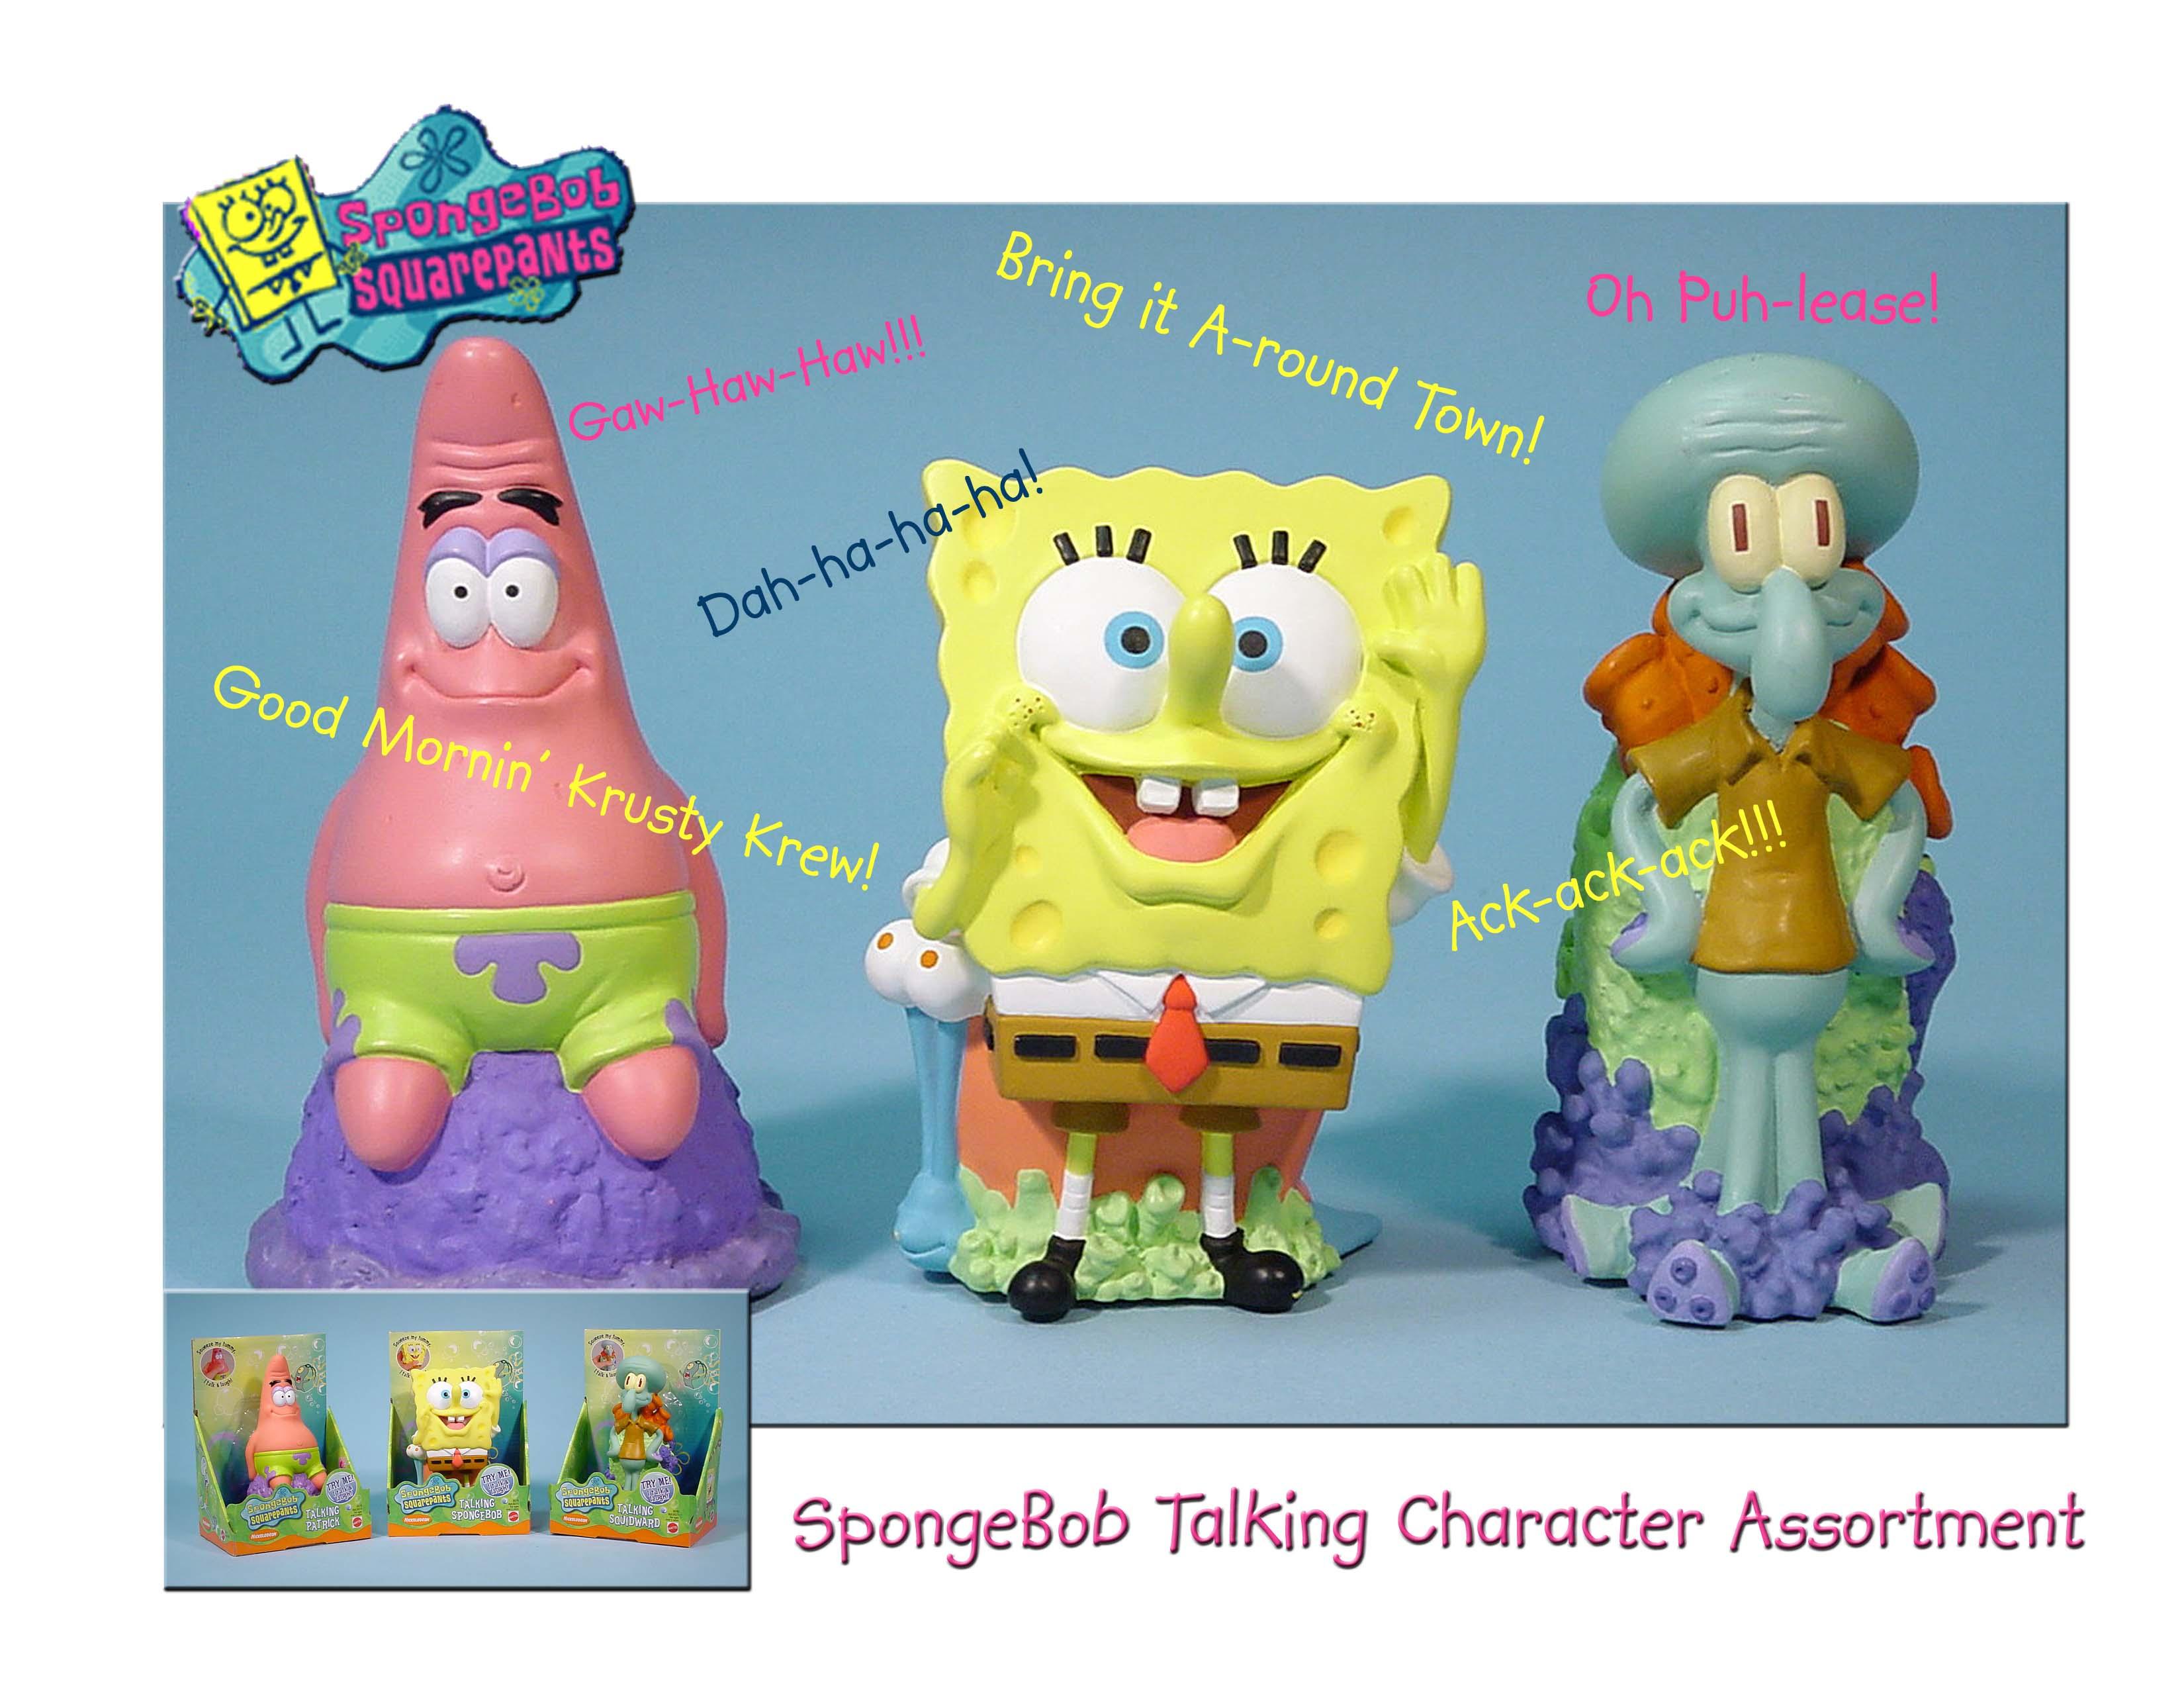 SpongeBob Squarepants By William Hirsch At Coroflotcom